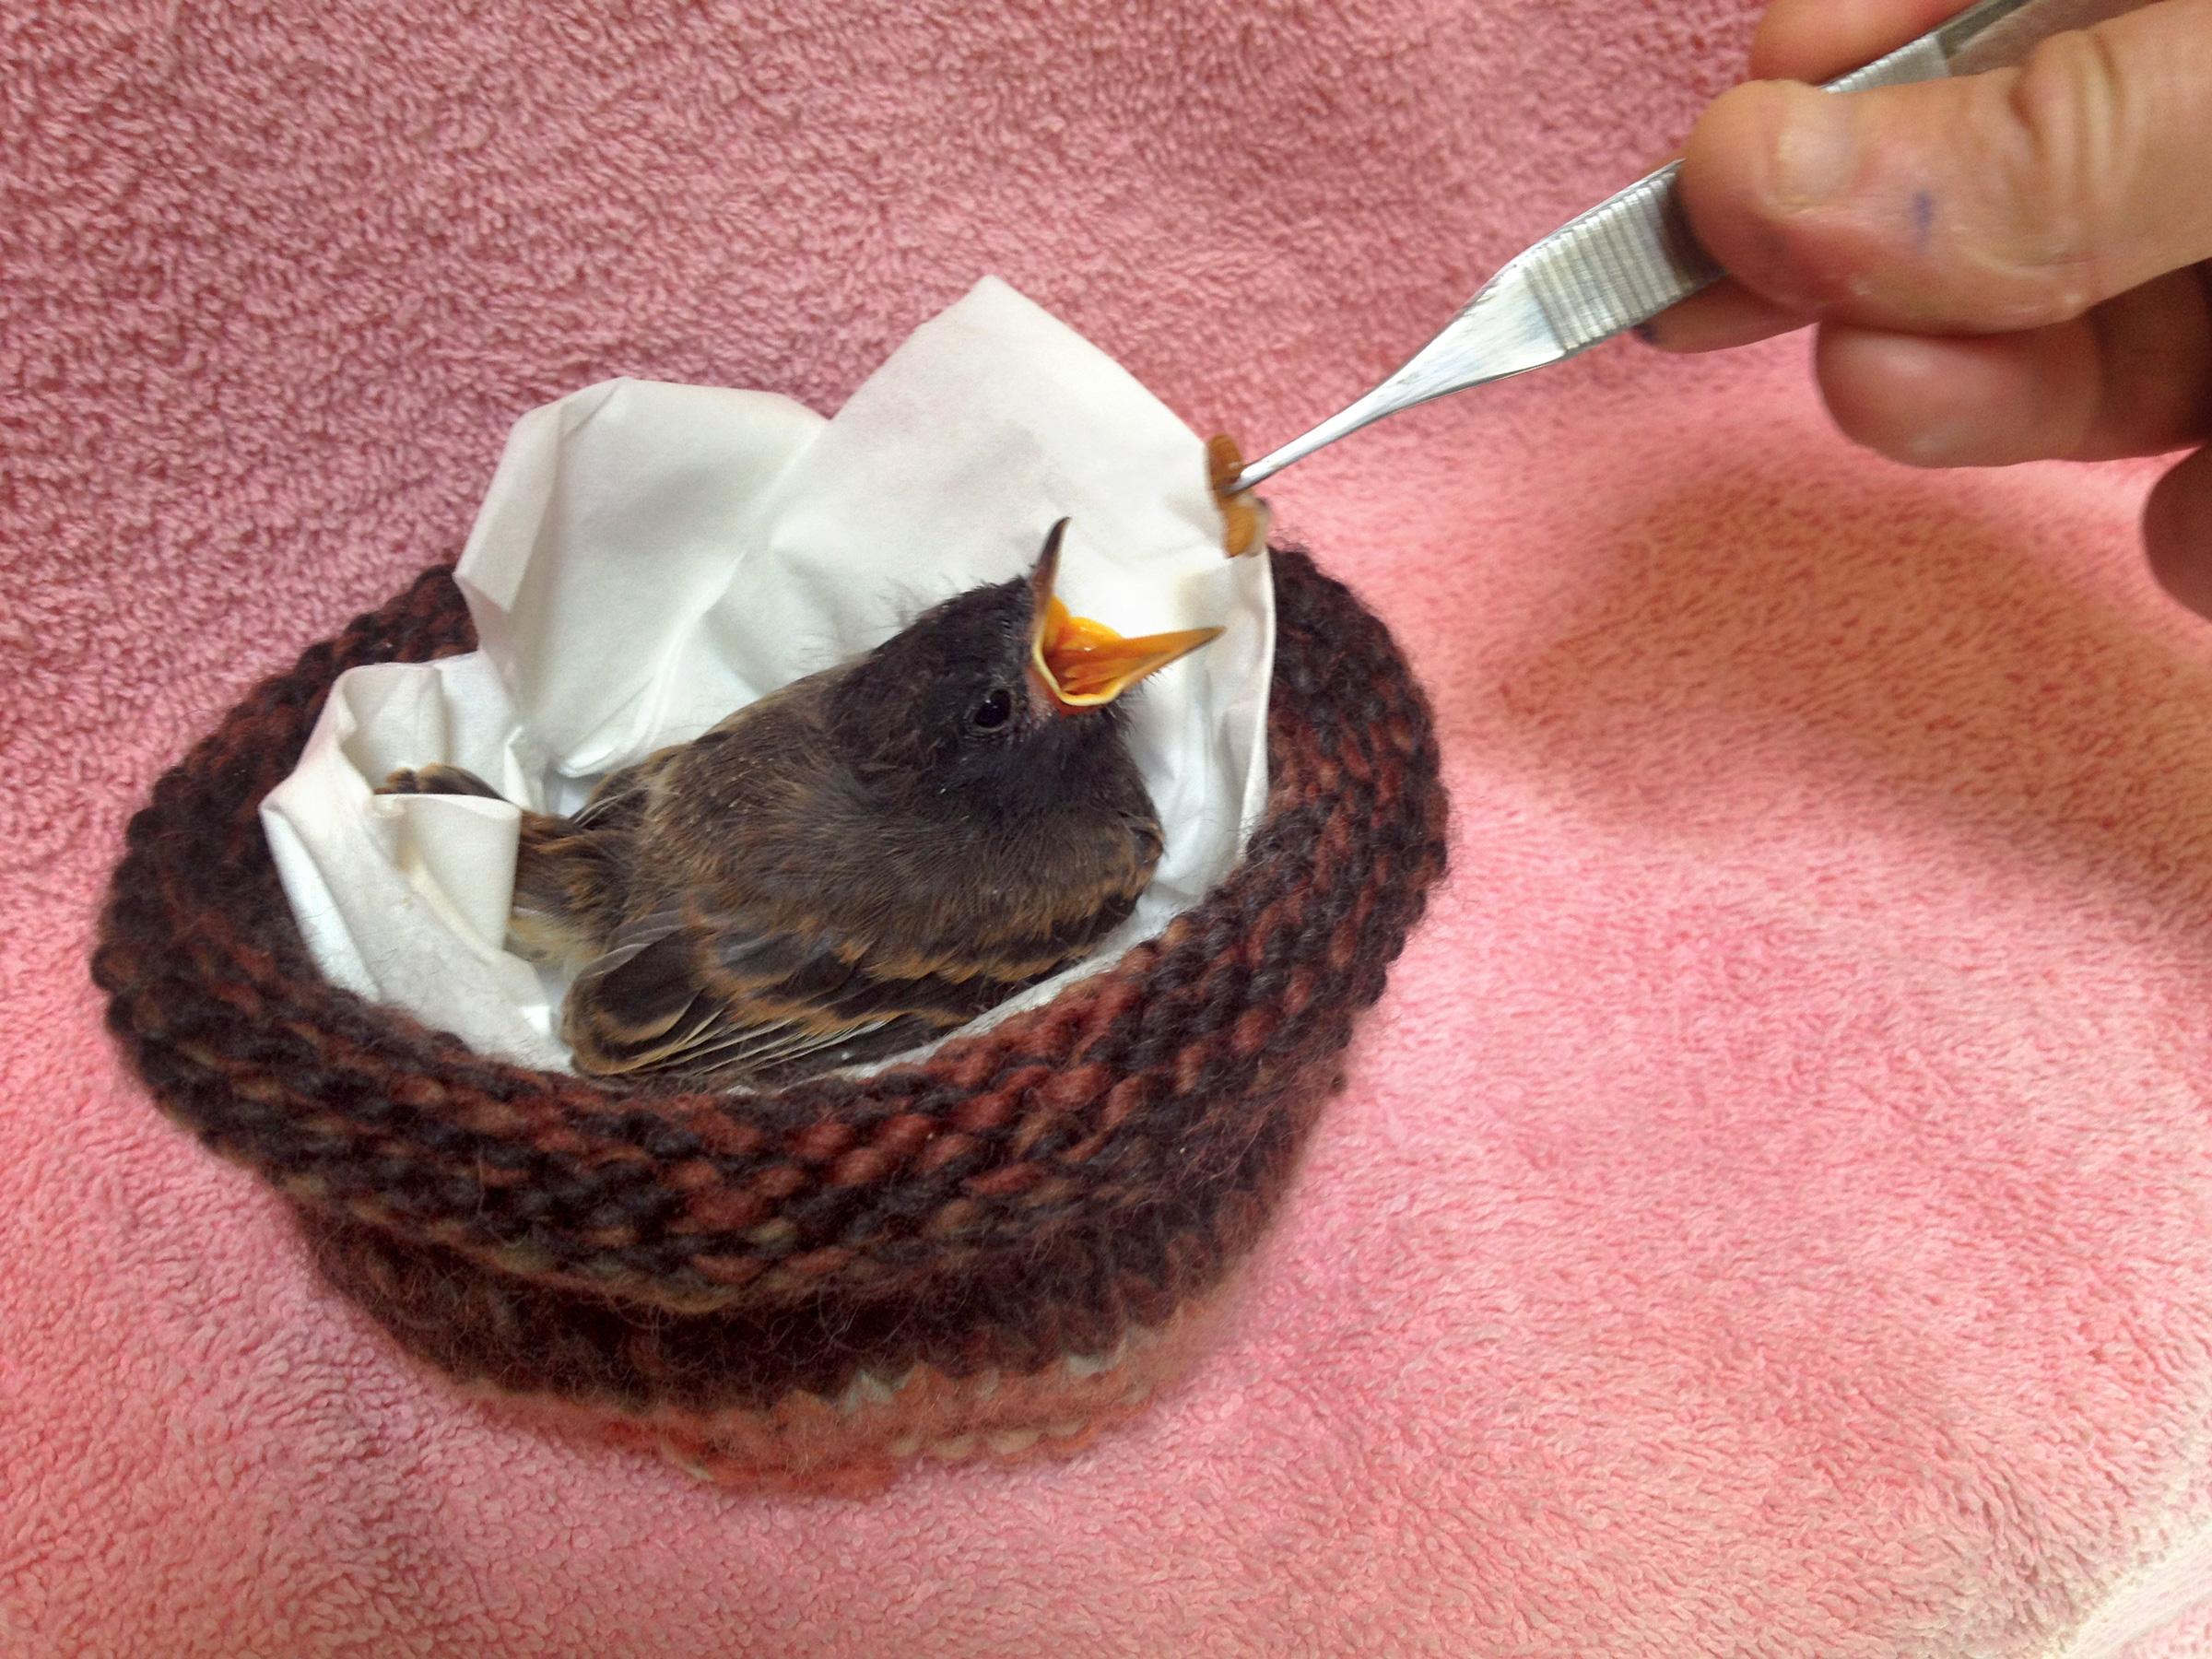 American Robin nestling. Melanie Piazza